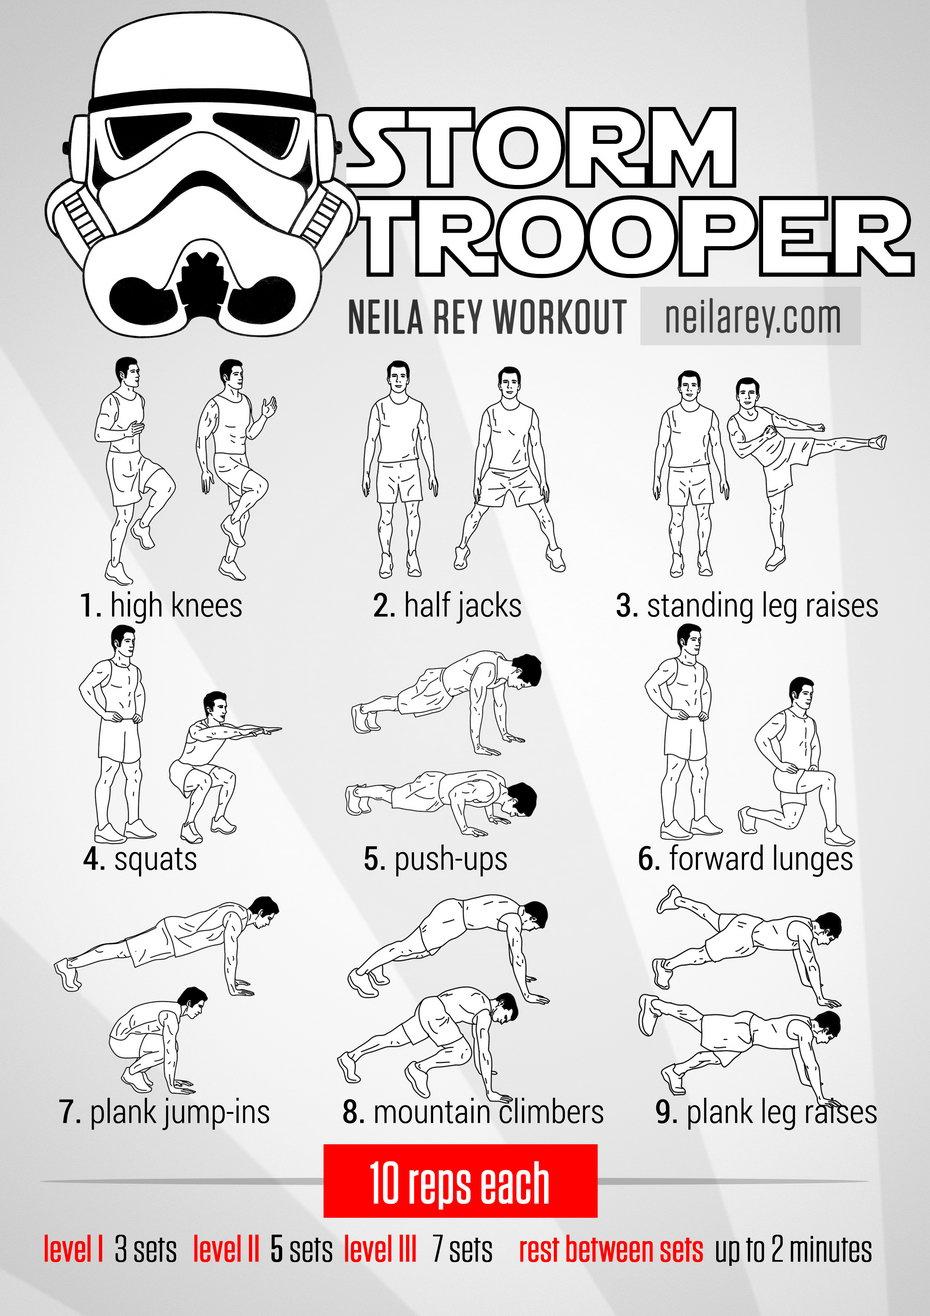 Stormtrooper Workout